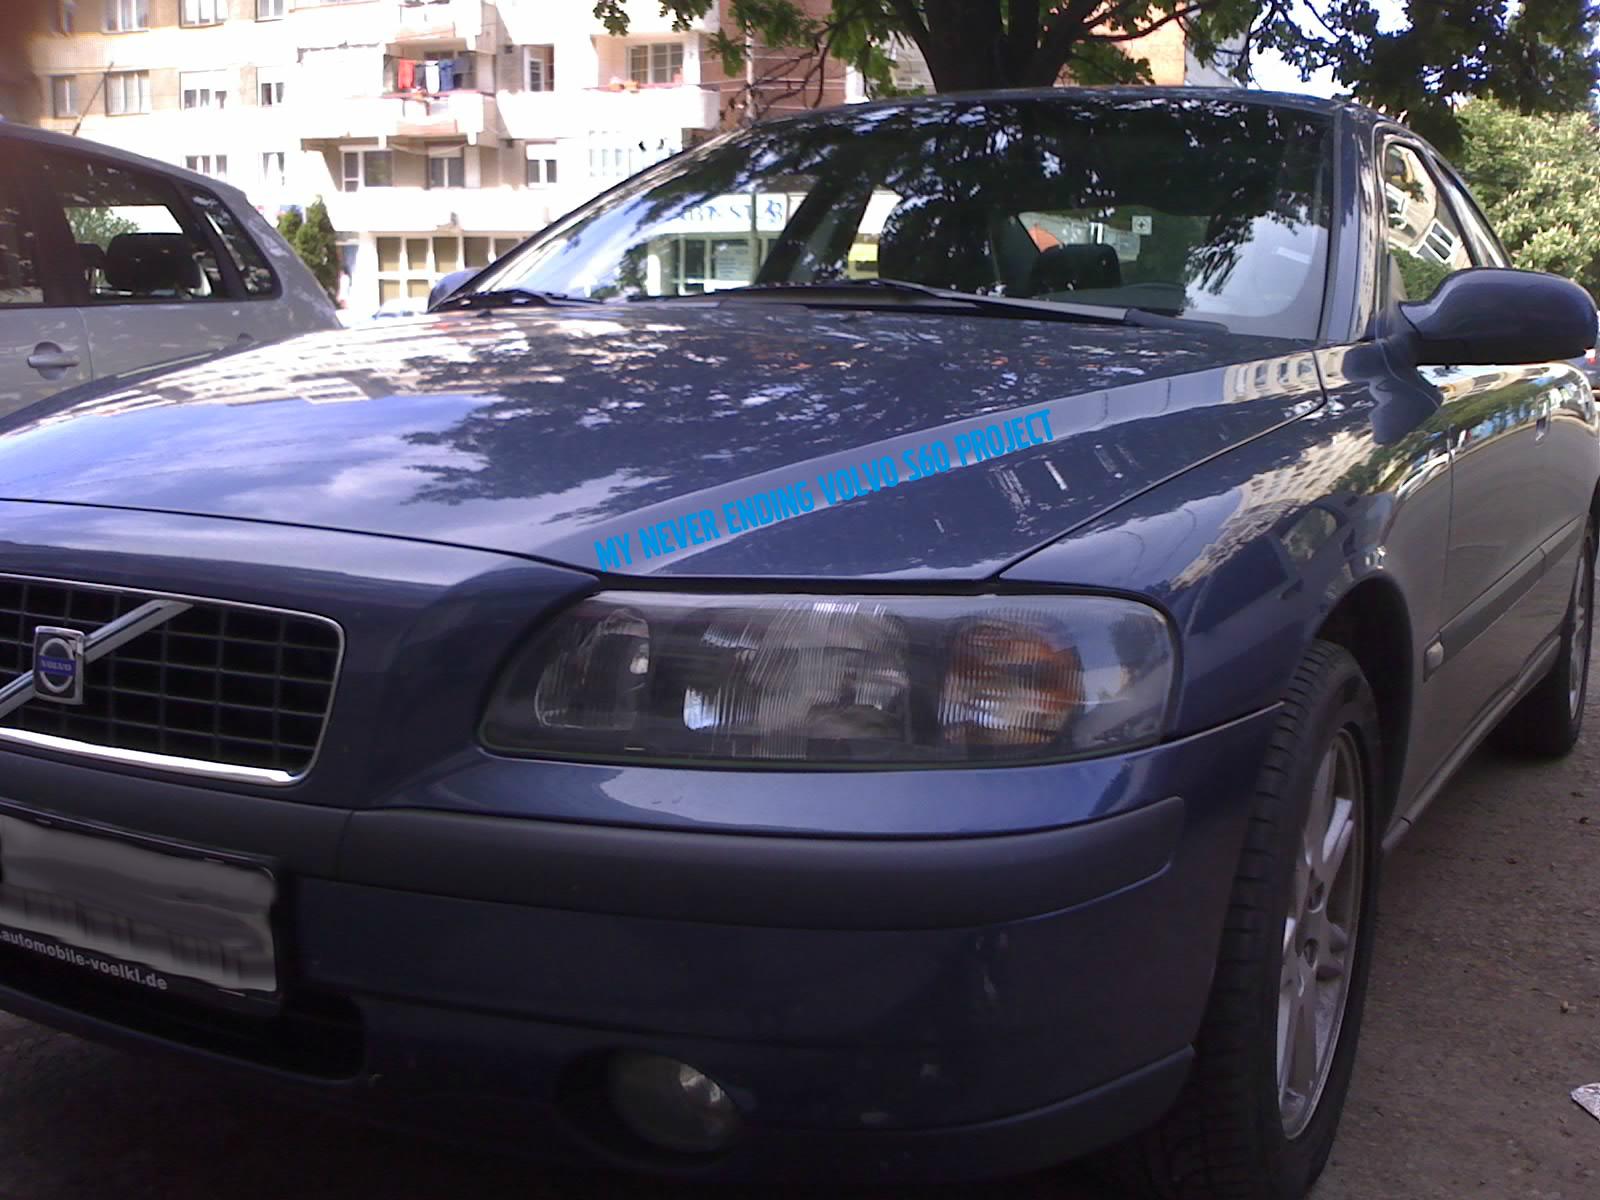 ro collision faded on volvo hayward car body union city repair wagon auto peeling paint fremont in